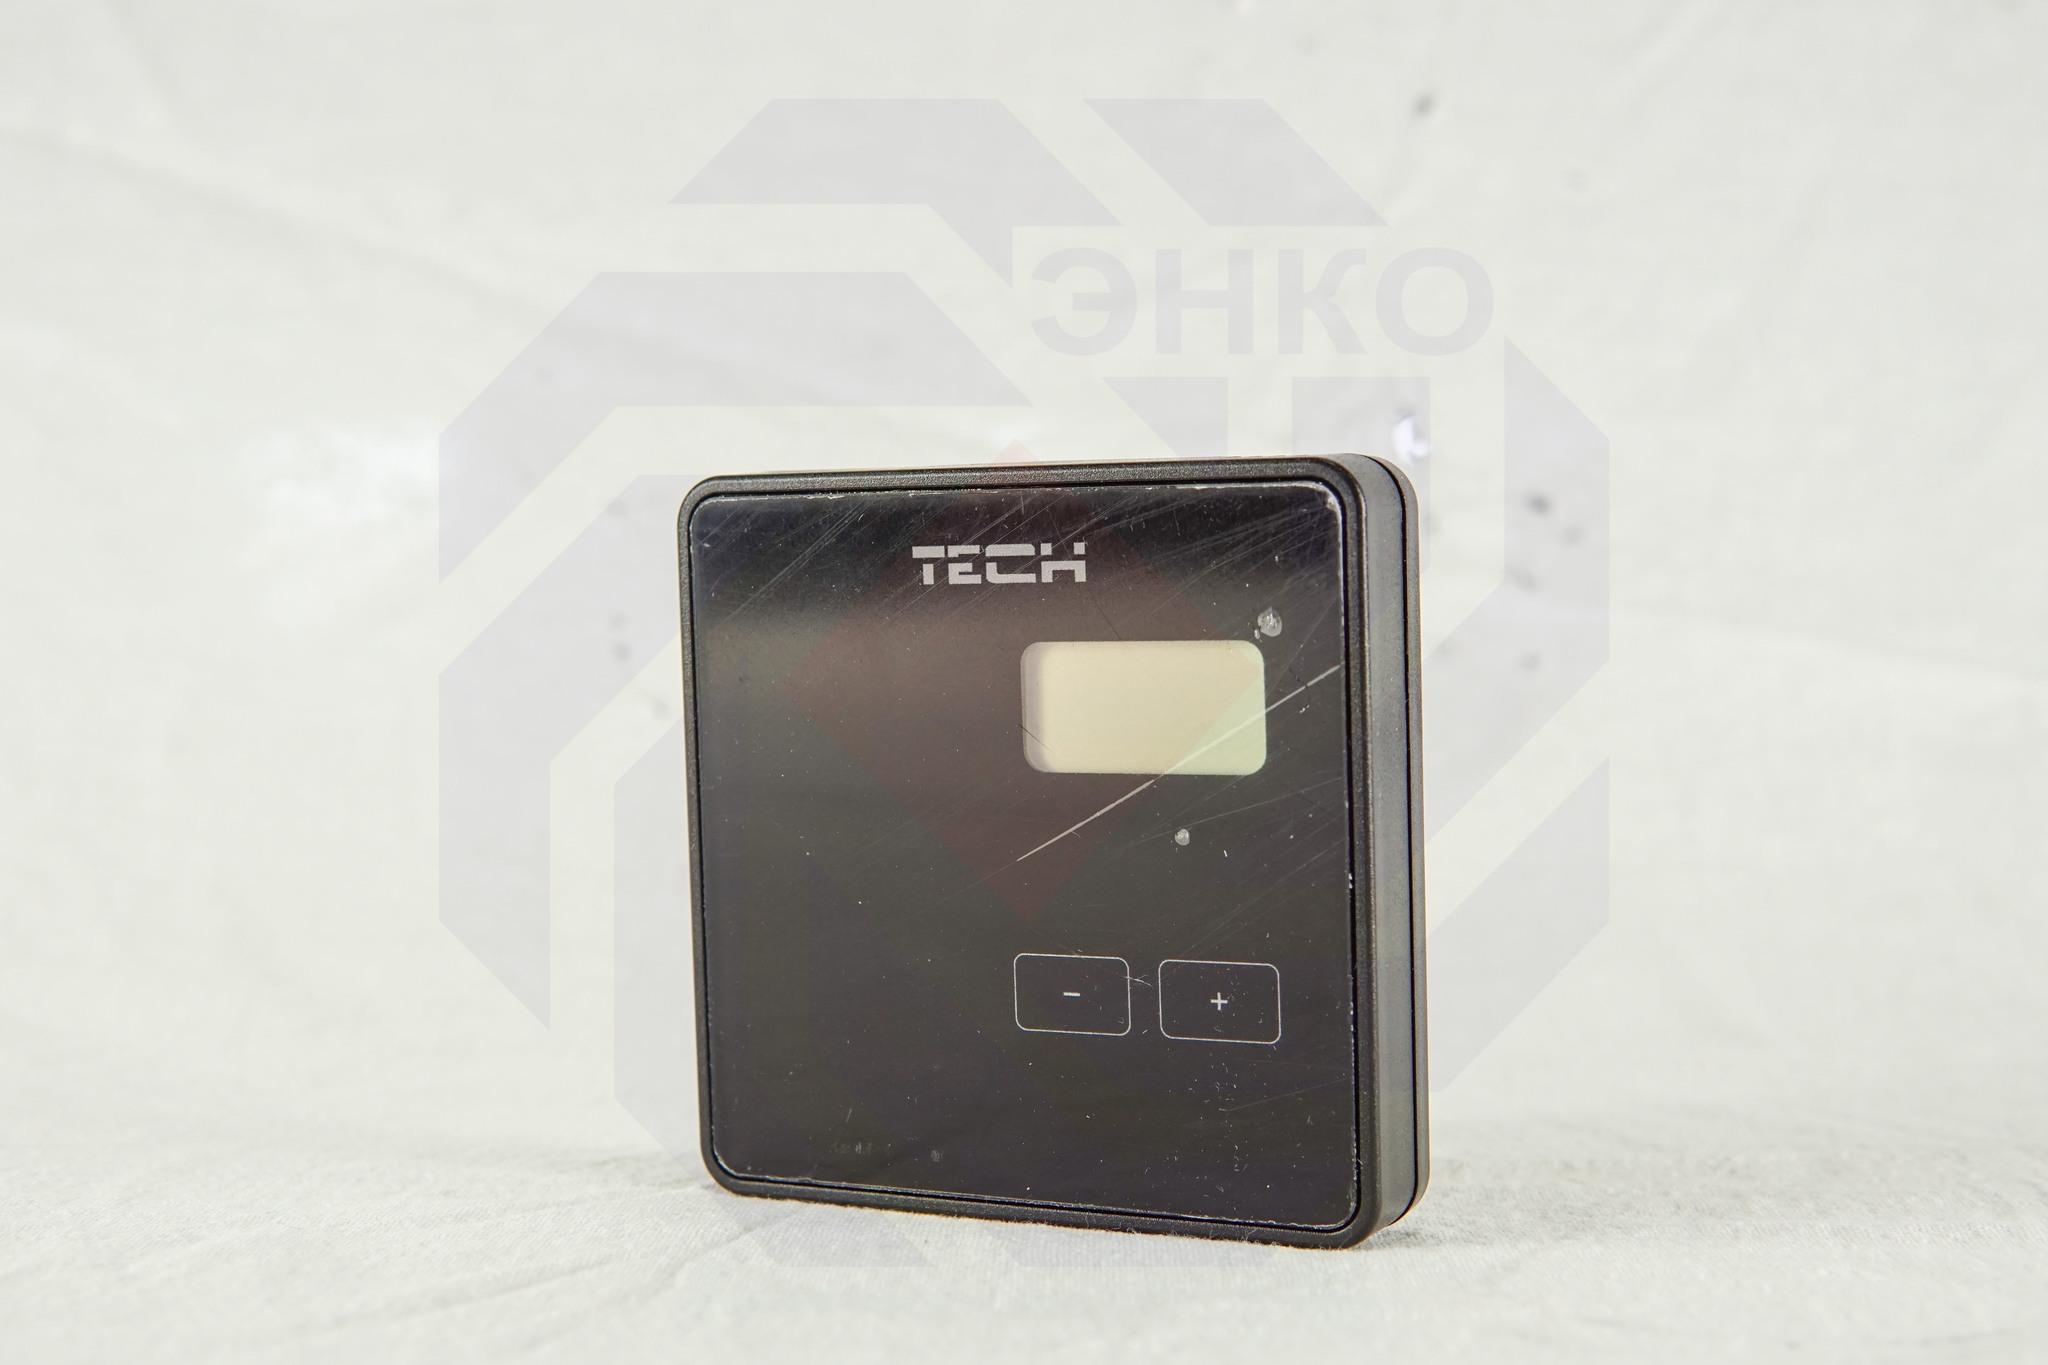 Термостат комнатный TECH STEROWNIKI ST-R-8B черный